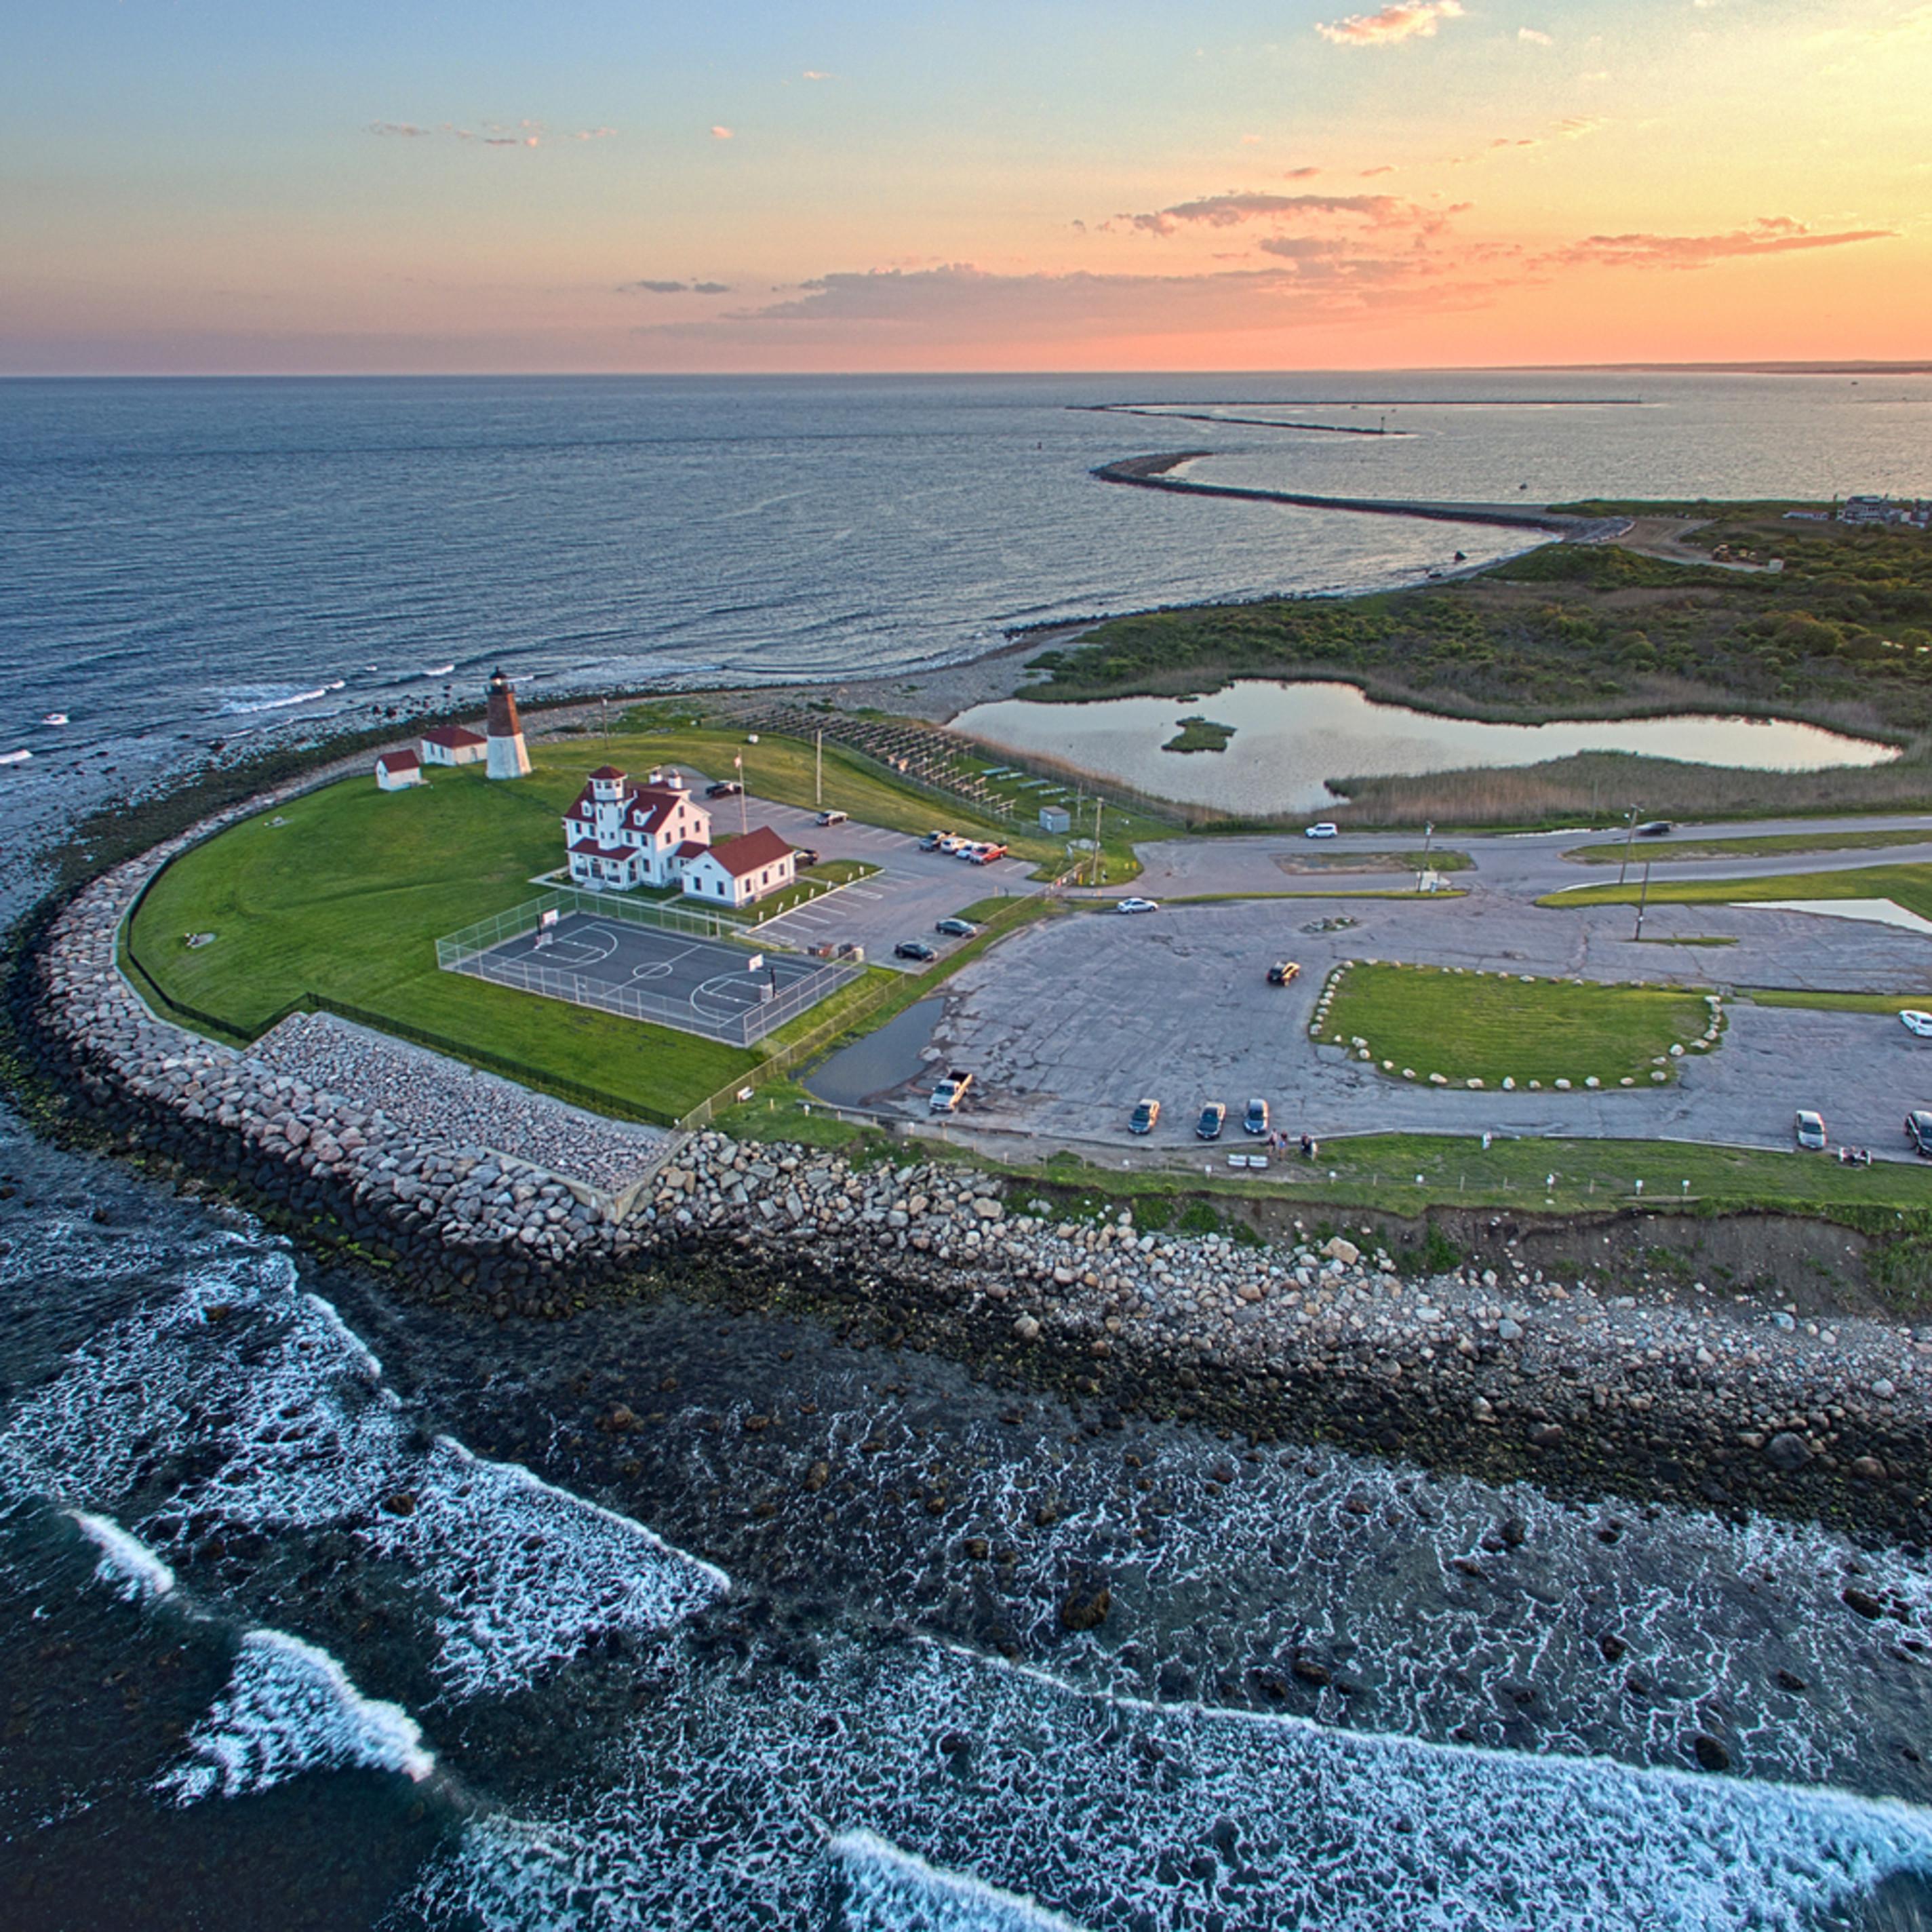 Pt judith lighthouse aerial sunset 2 il8vzz